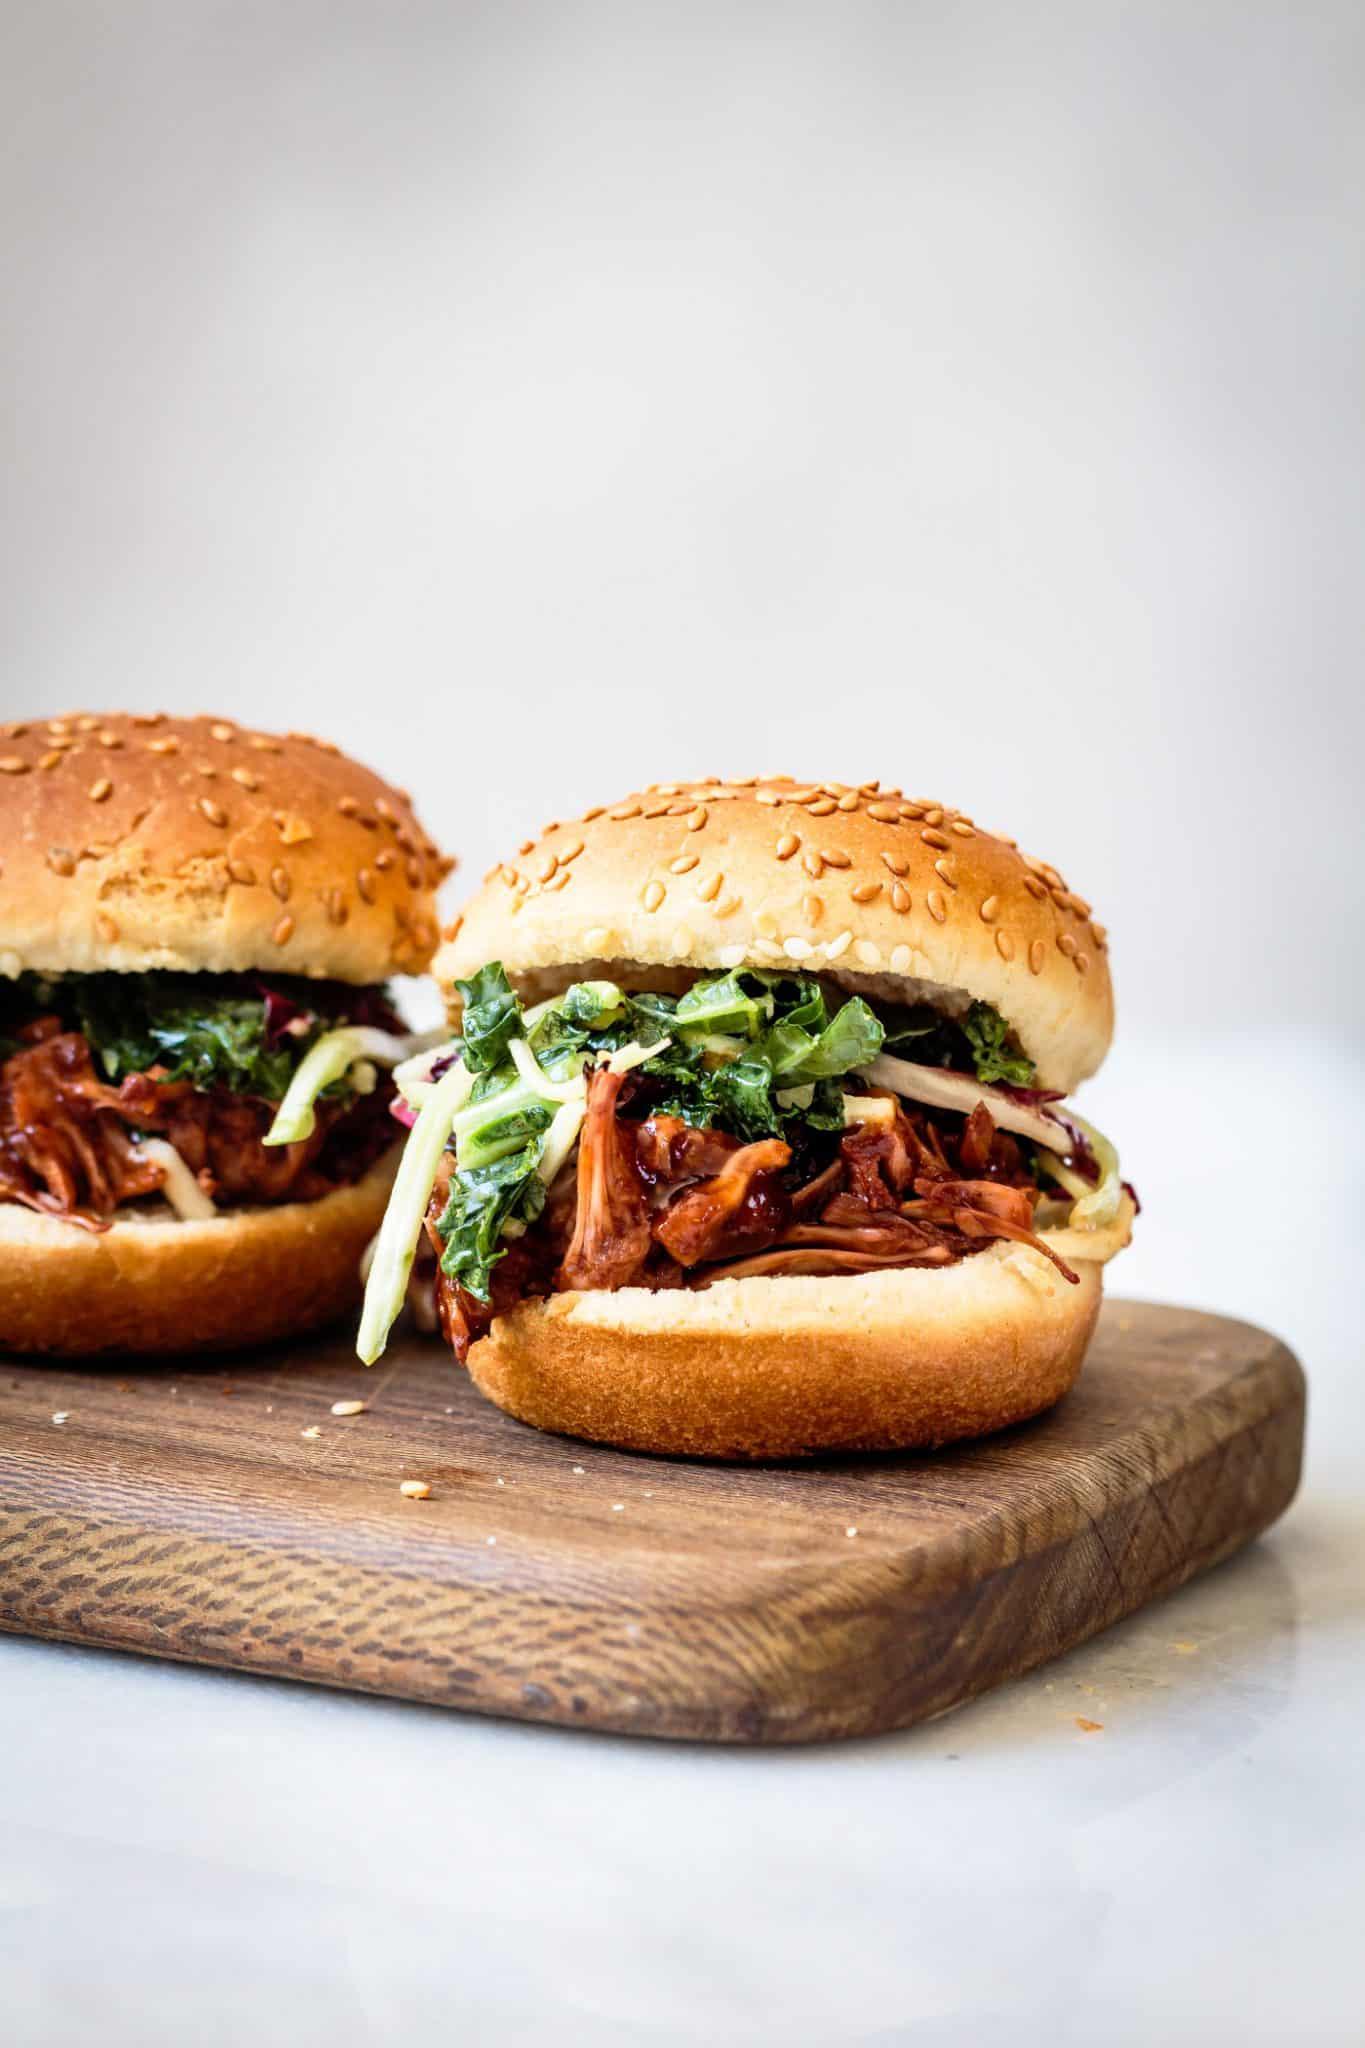 Jackfruit Sandwiches – Meaty Replacement